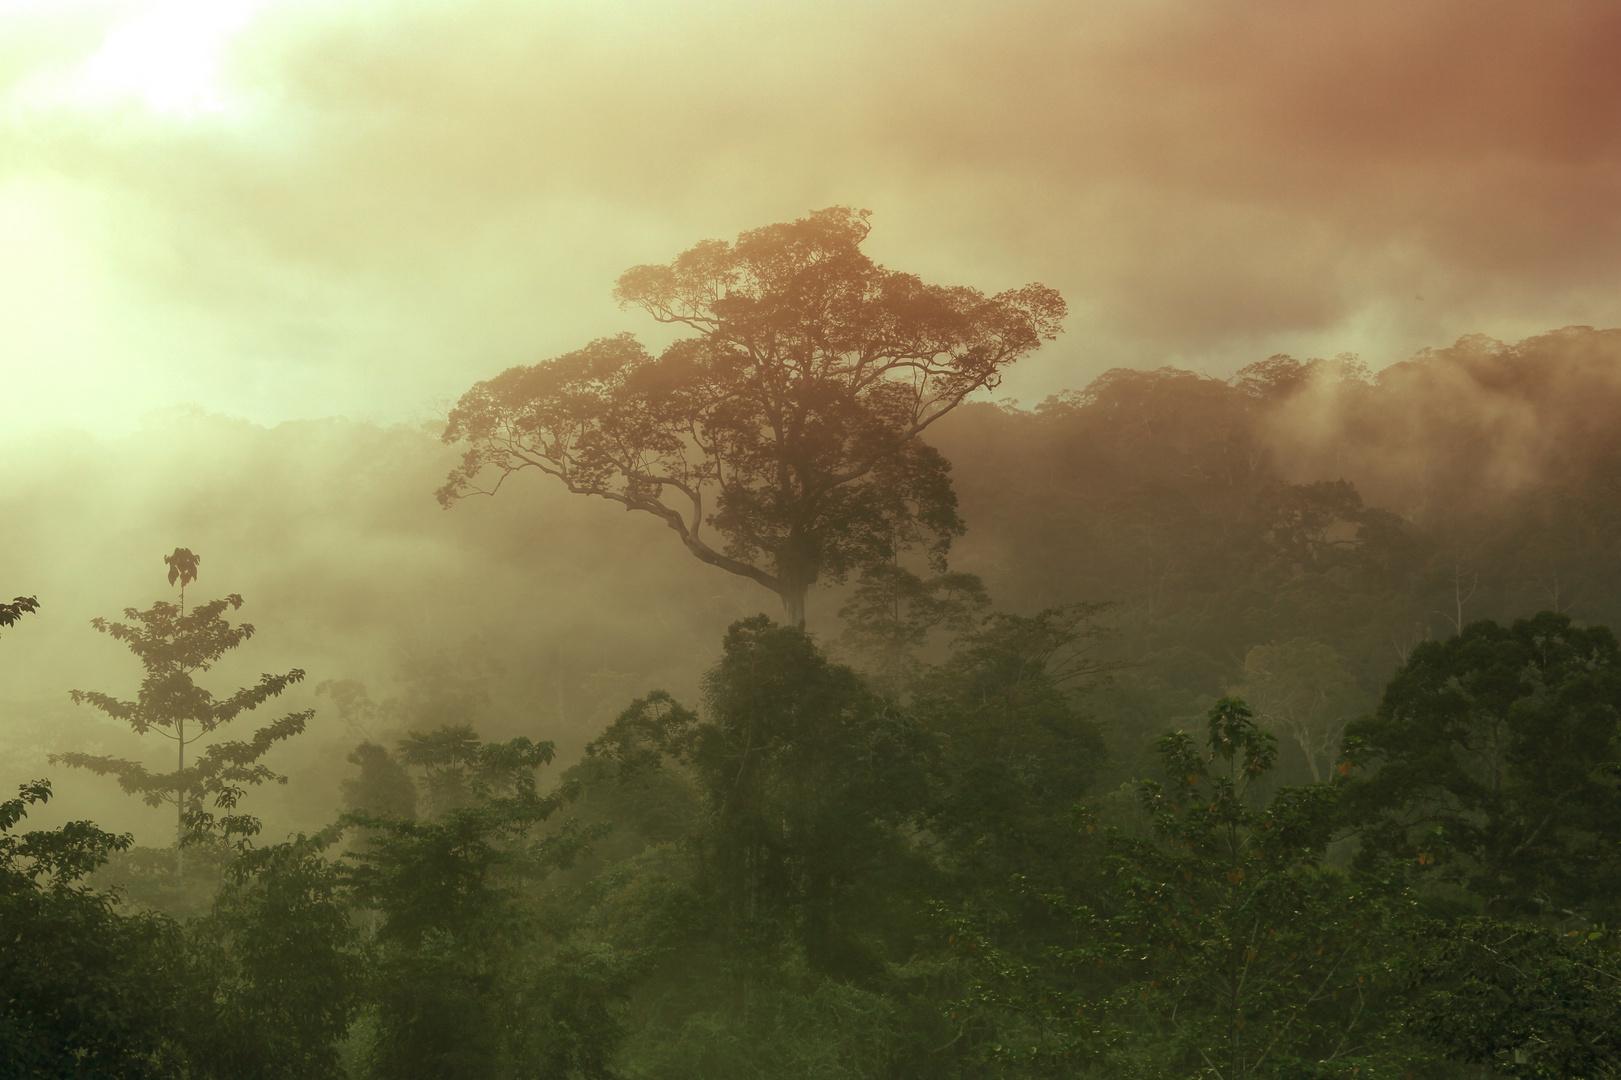 Danum Valley - Sabbah / Borneo - Morning Fog Scene